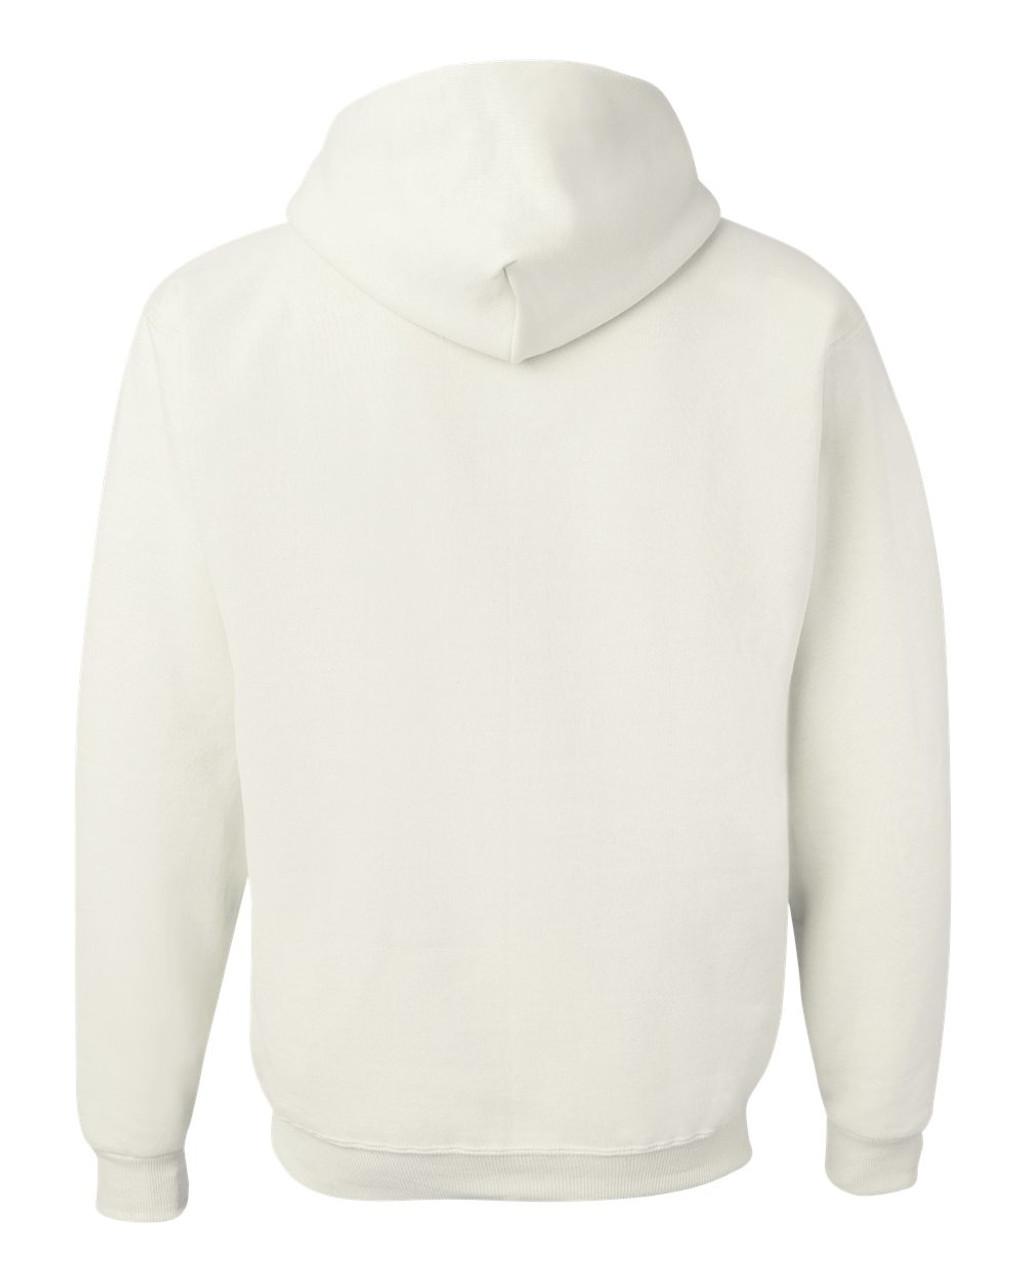 996MR JERZEES NuBlend® Hooded Sweatshirt | T-shirt.ca